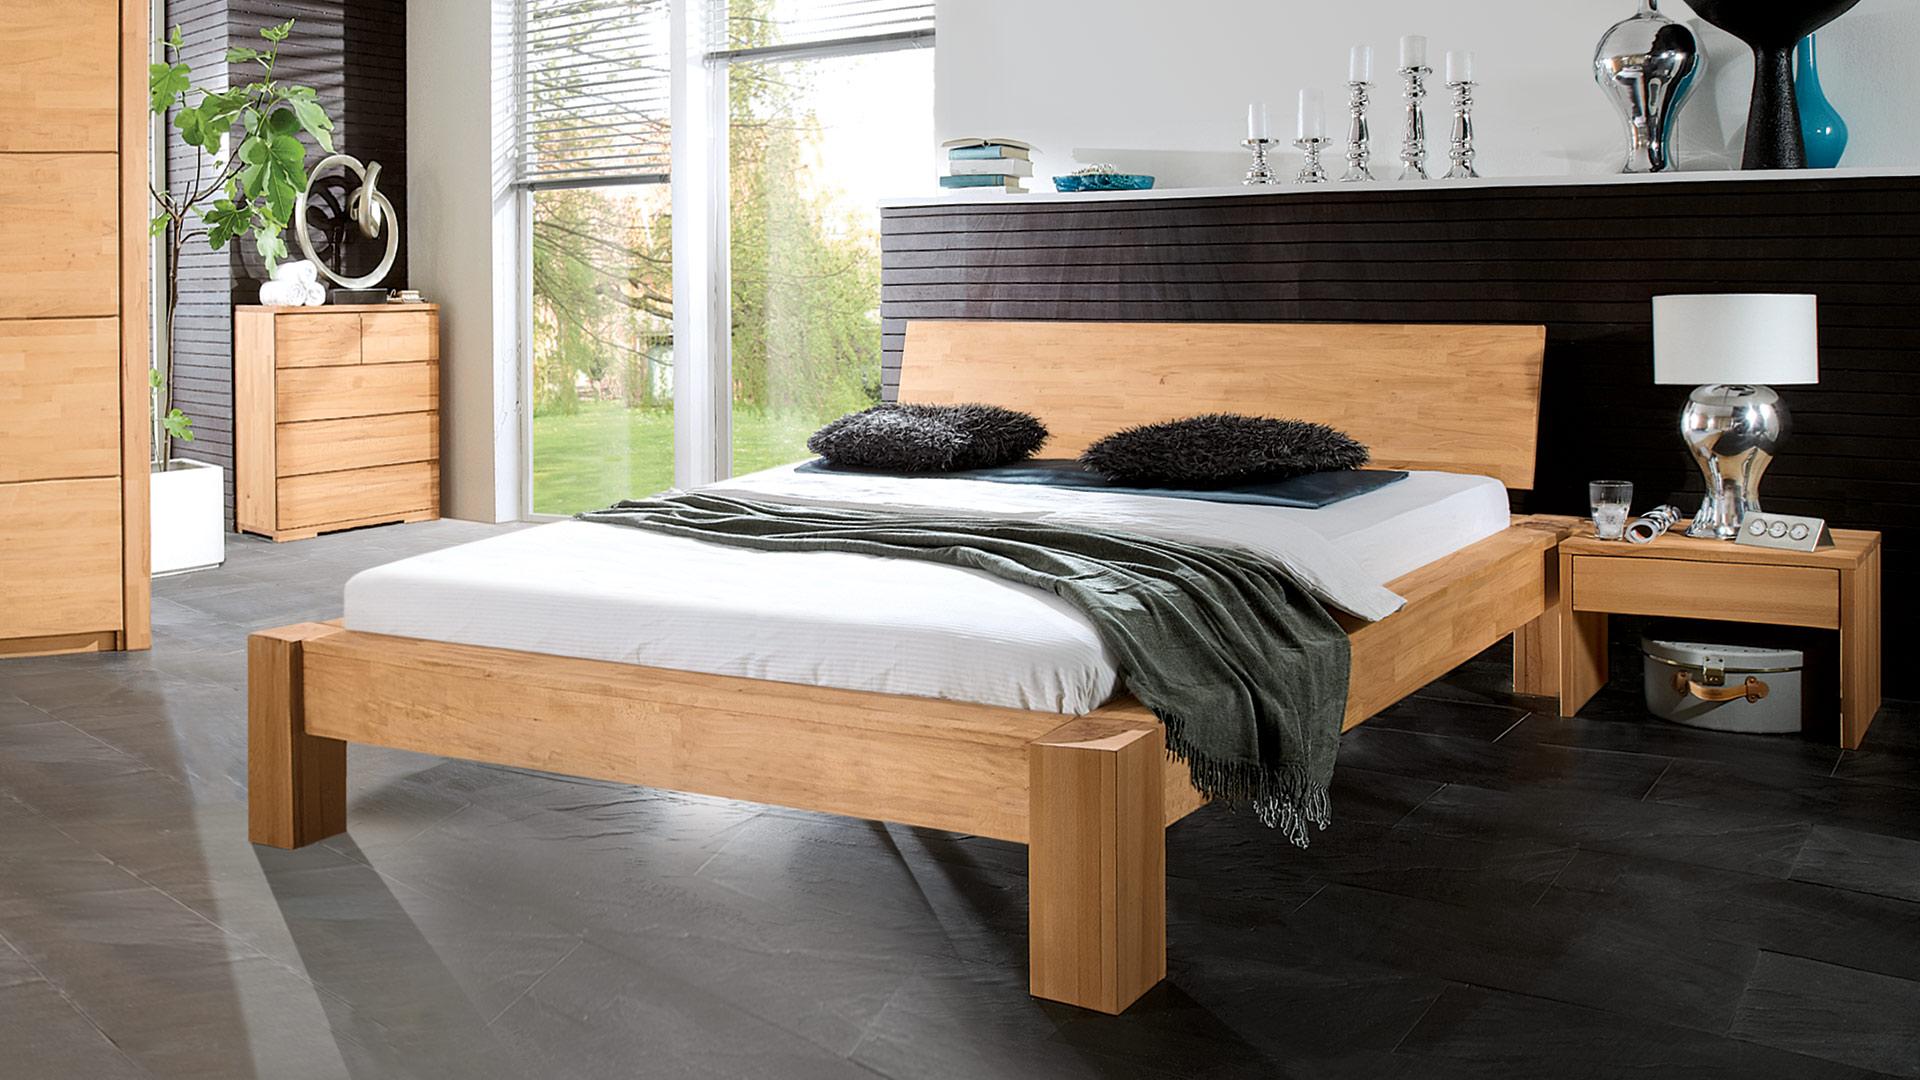 Full Size of Komplettbett 180x220 Bett 120x200 Mit Matratze Und Lattenrost Massiv Betten Wohnzimmer Komplettbett 180x220